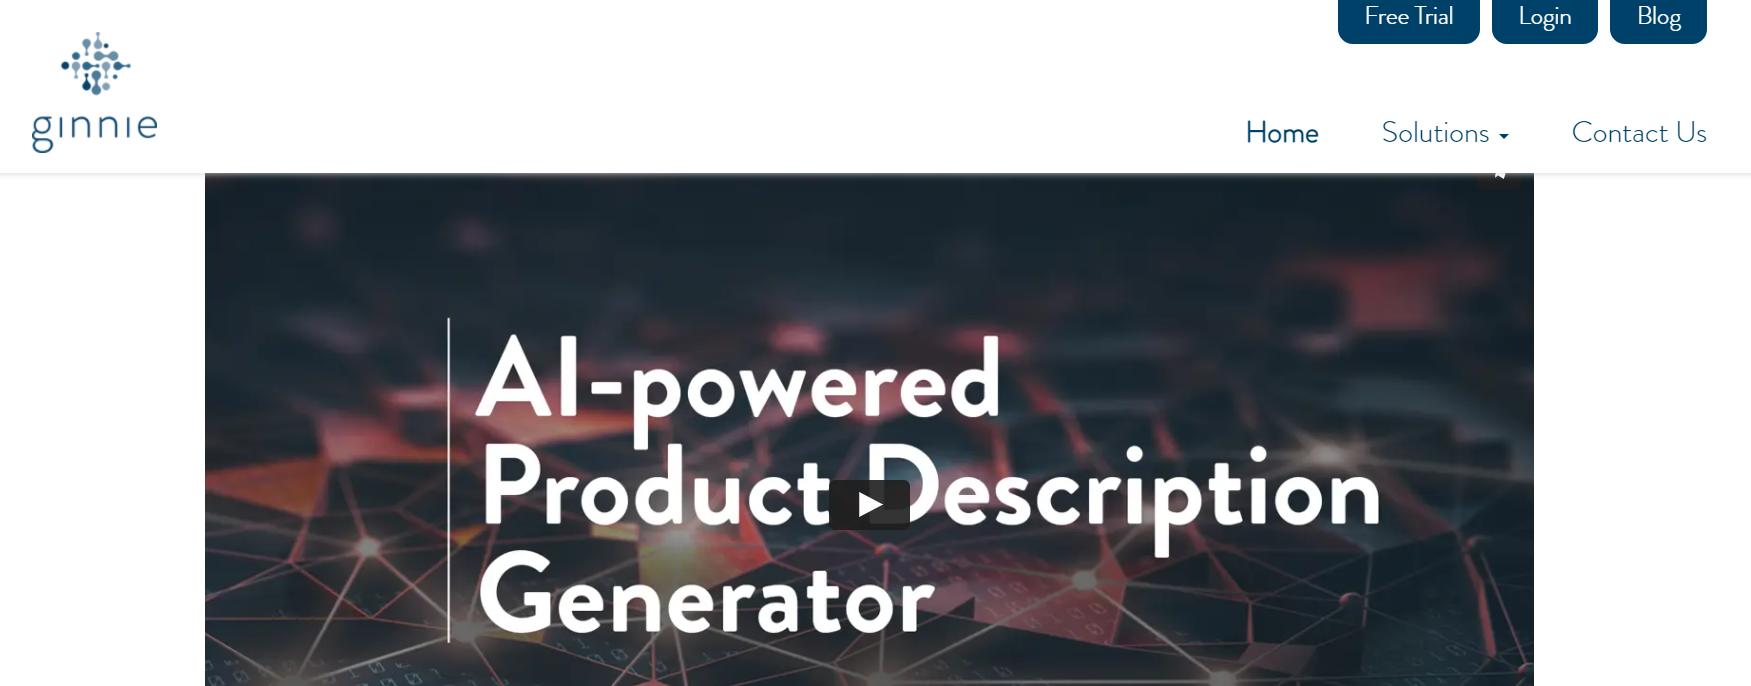 SEO product description generator